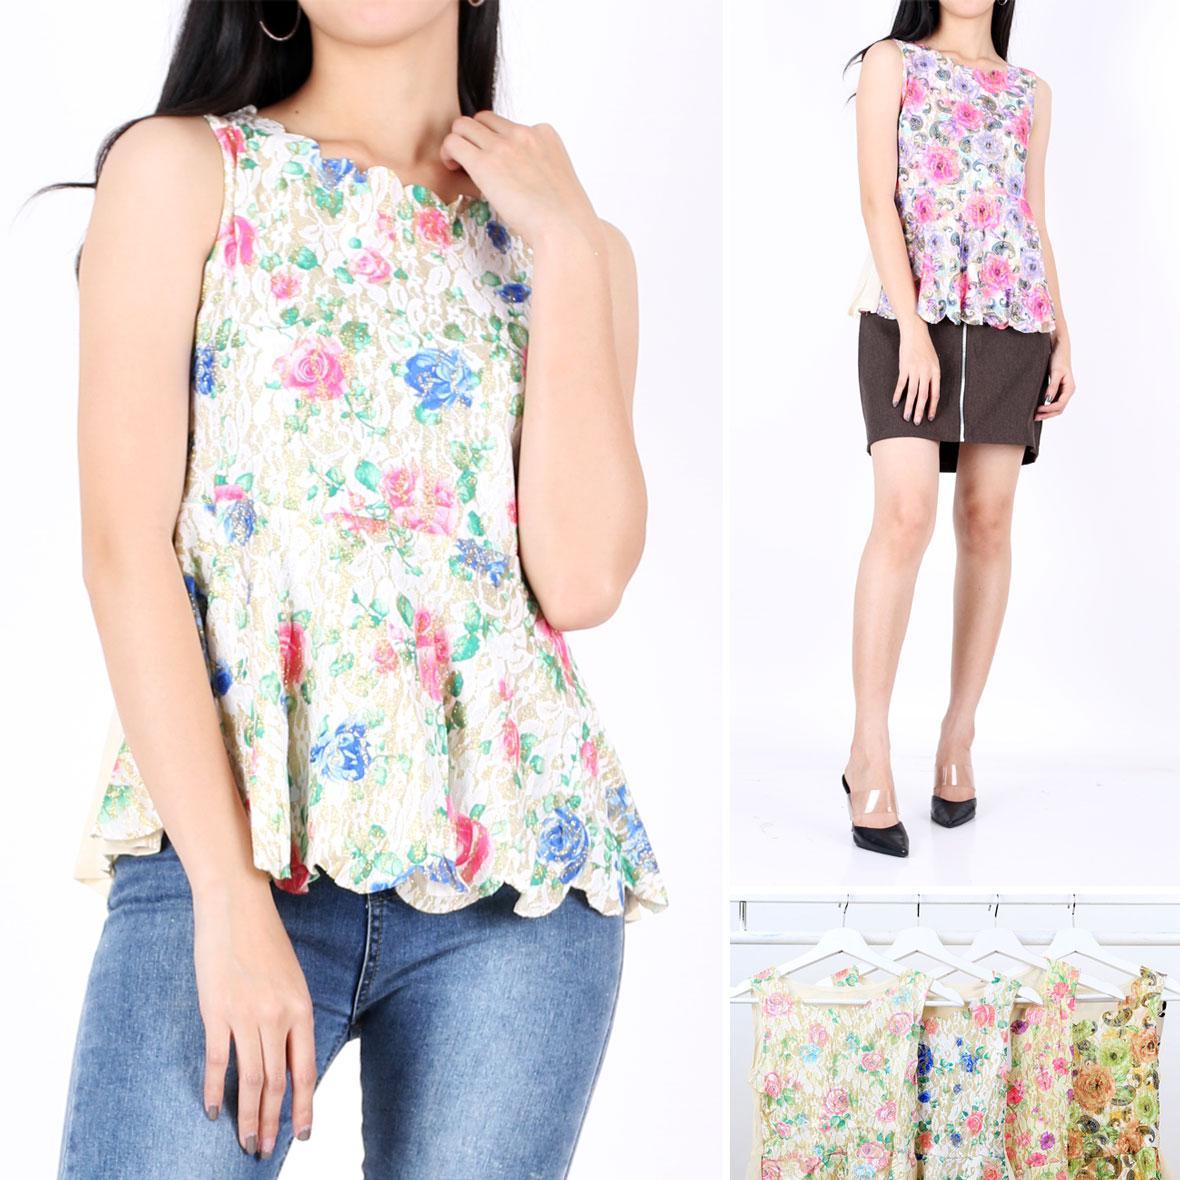 Oma Holley Fashion Regan Baju Import Baju Atasan Baju Wanita Baju Blouse Baju Tunik Baju Kerja